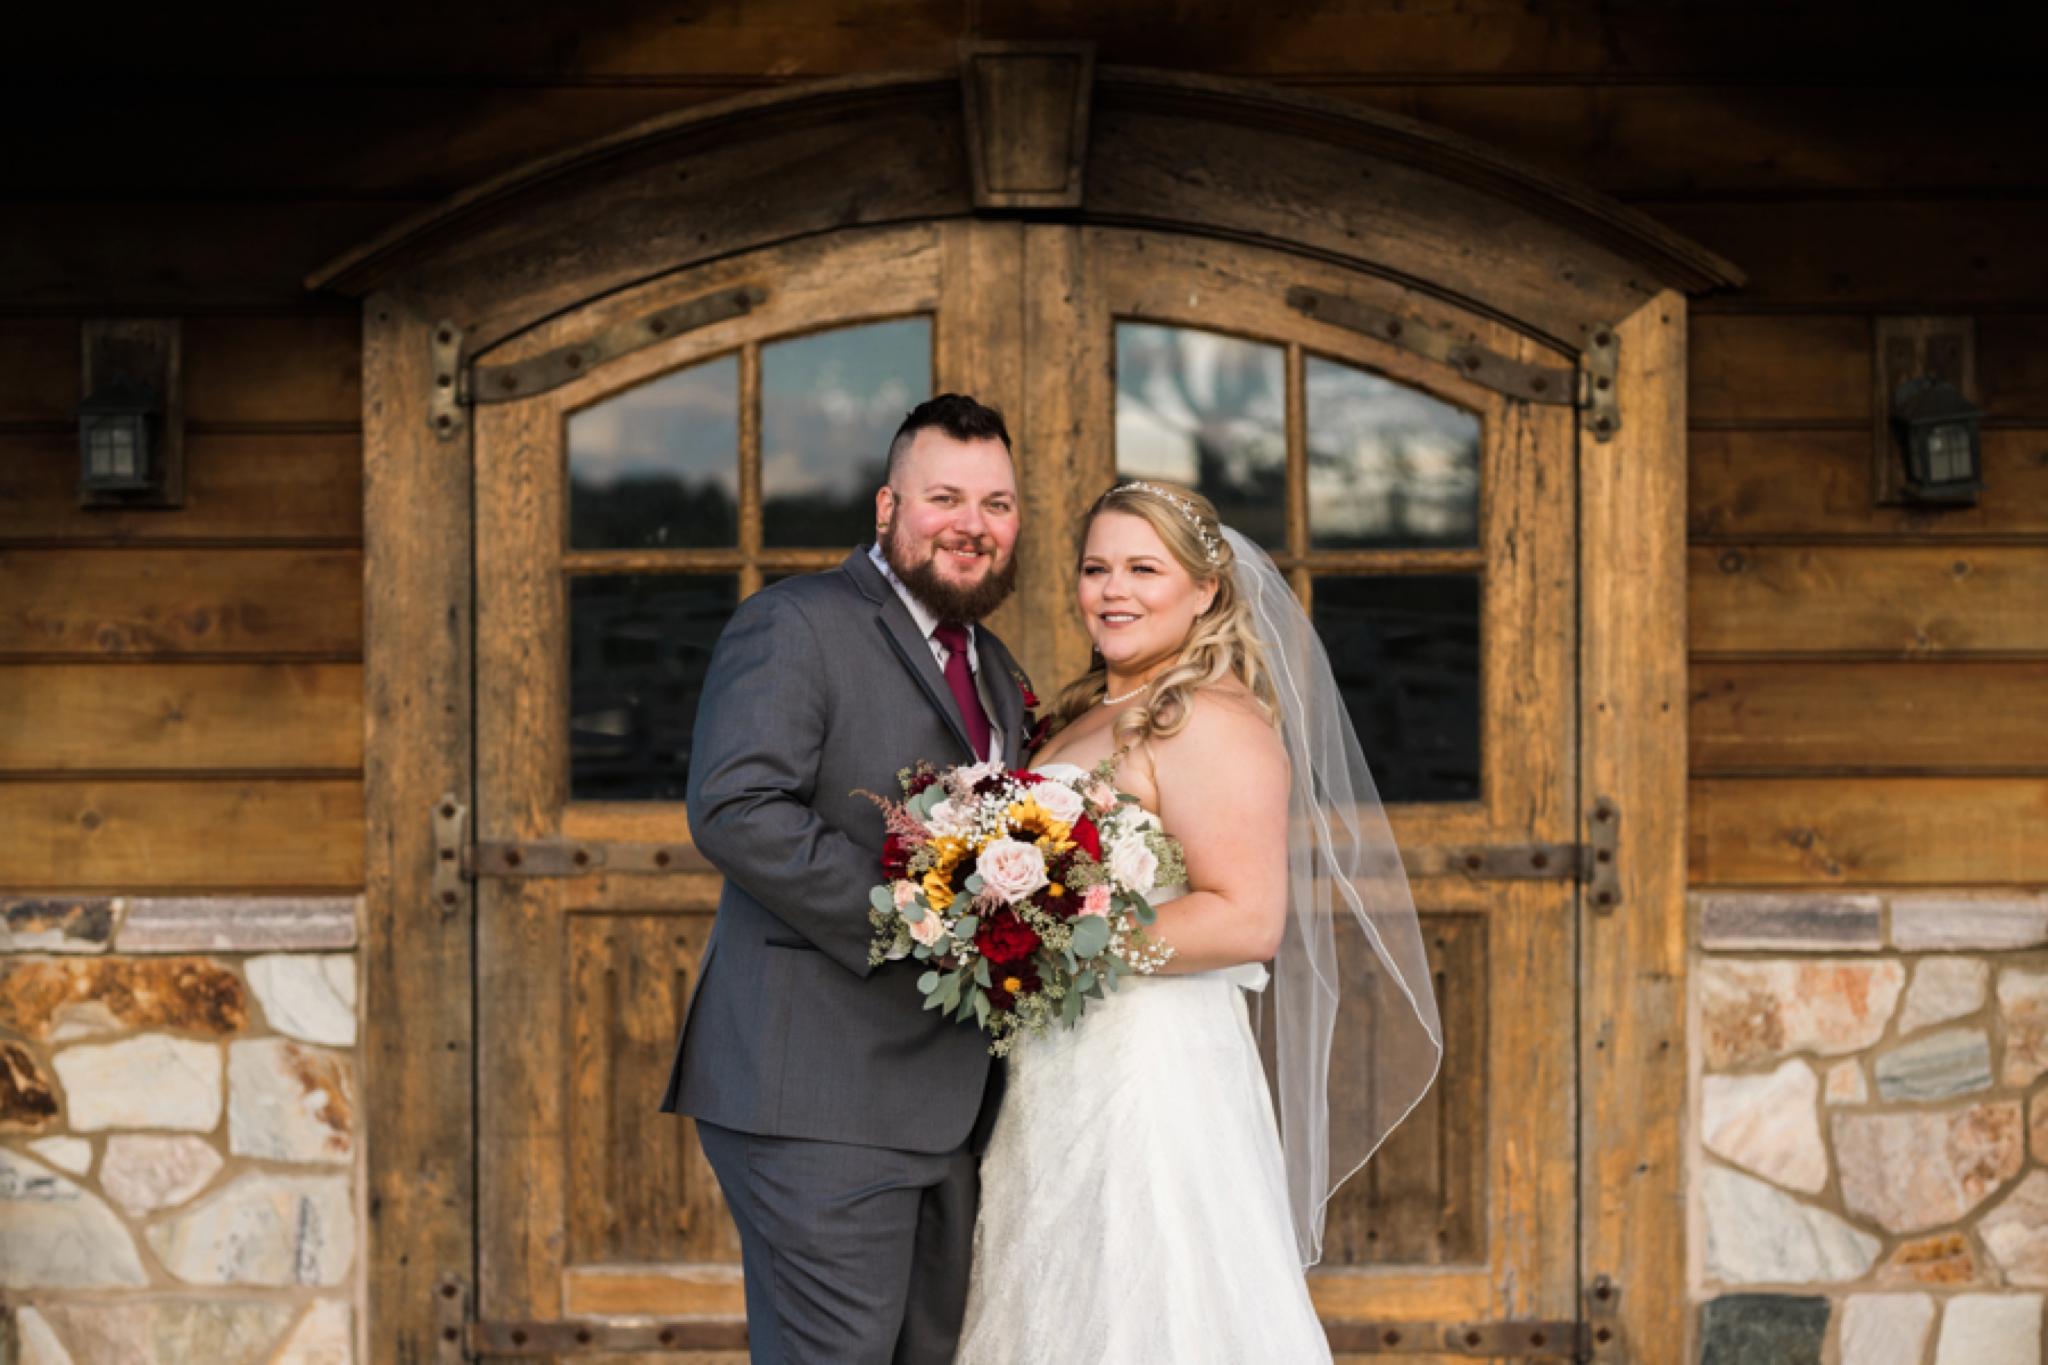 Emily Grace Photography, York PA Wedding Photographer, Wyndridge Farm Wedding, Wyndridge Farm Craft Cider